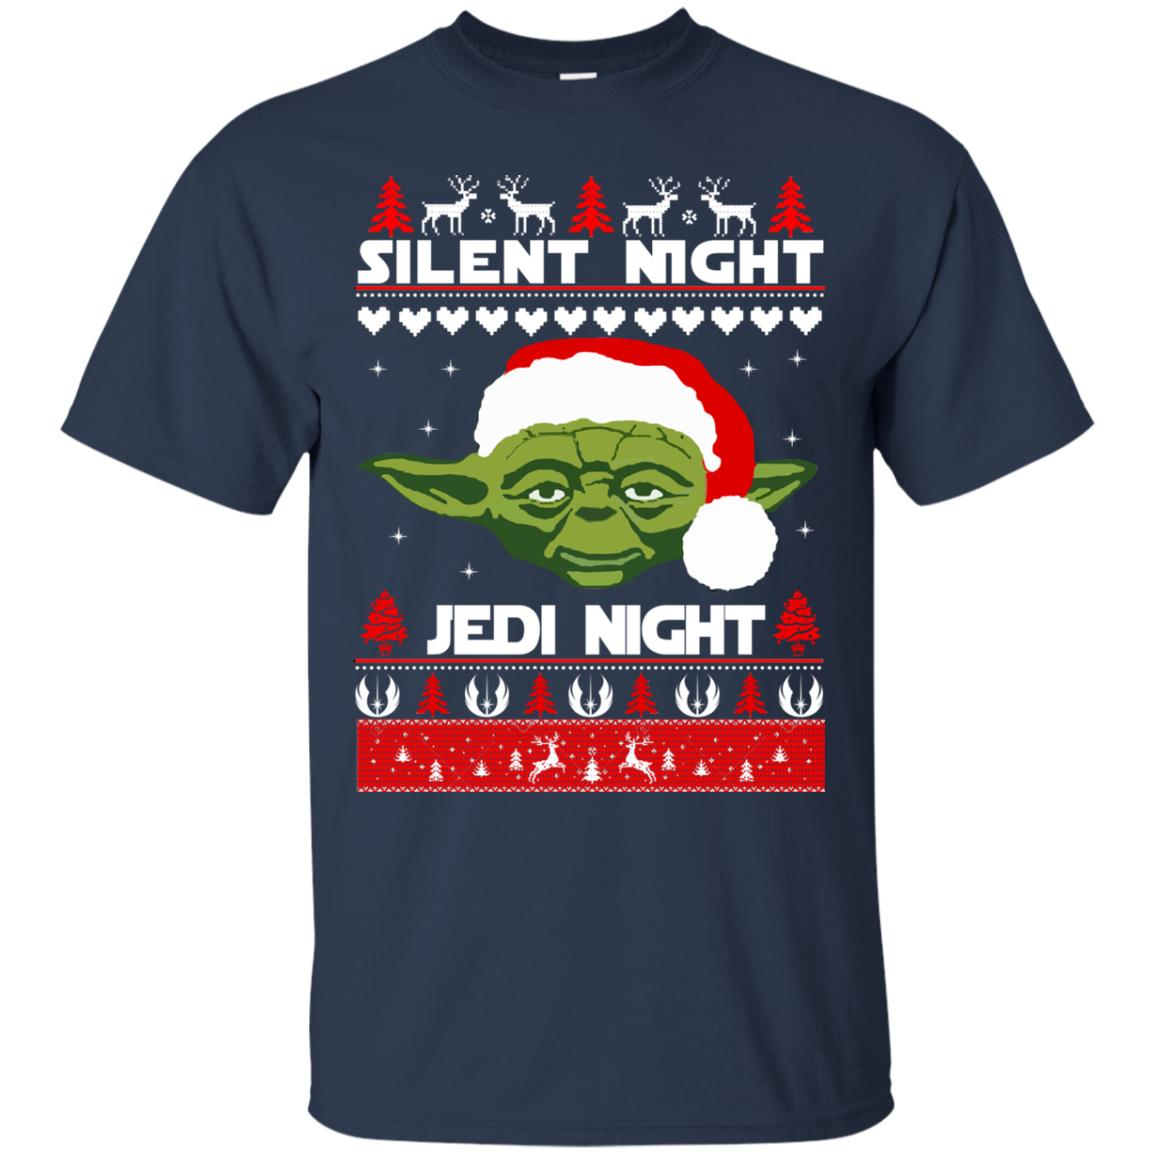 image 1711 - Yoda Star Wars: Silent Night Jedi Night Christmas Sweater, Hoodie